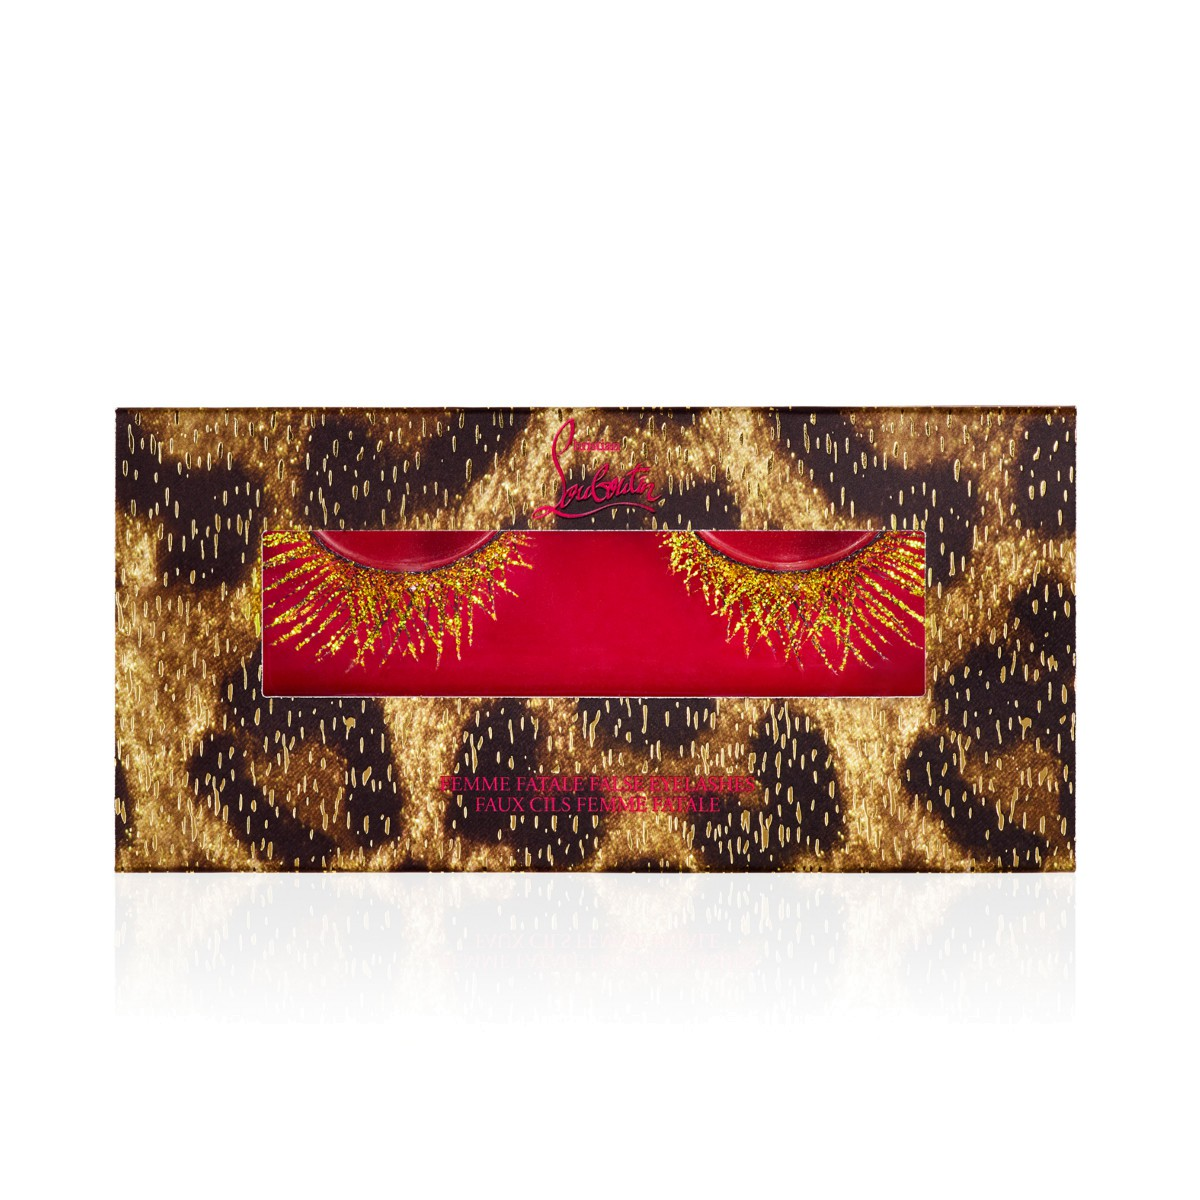 Beauty - Loubiléopard False Eyelashes - Christian Louboutin